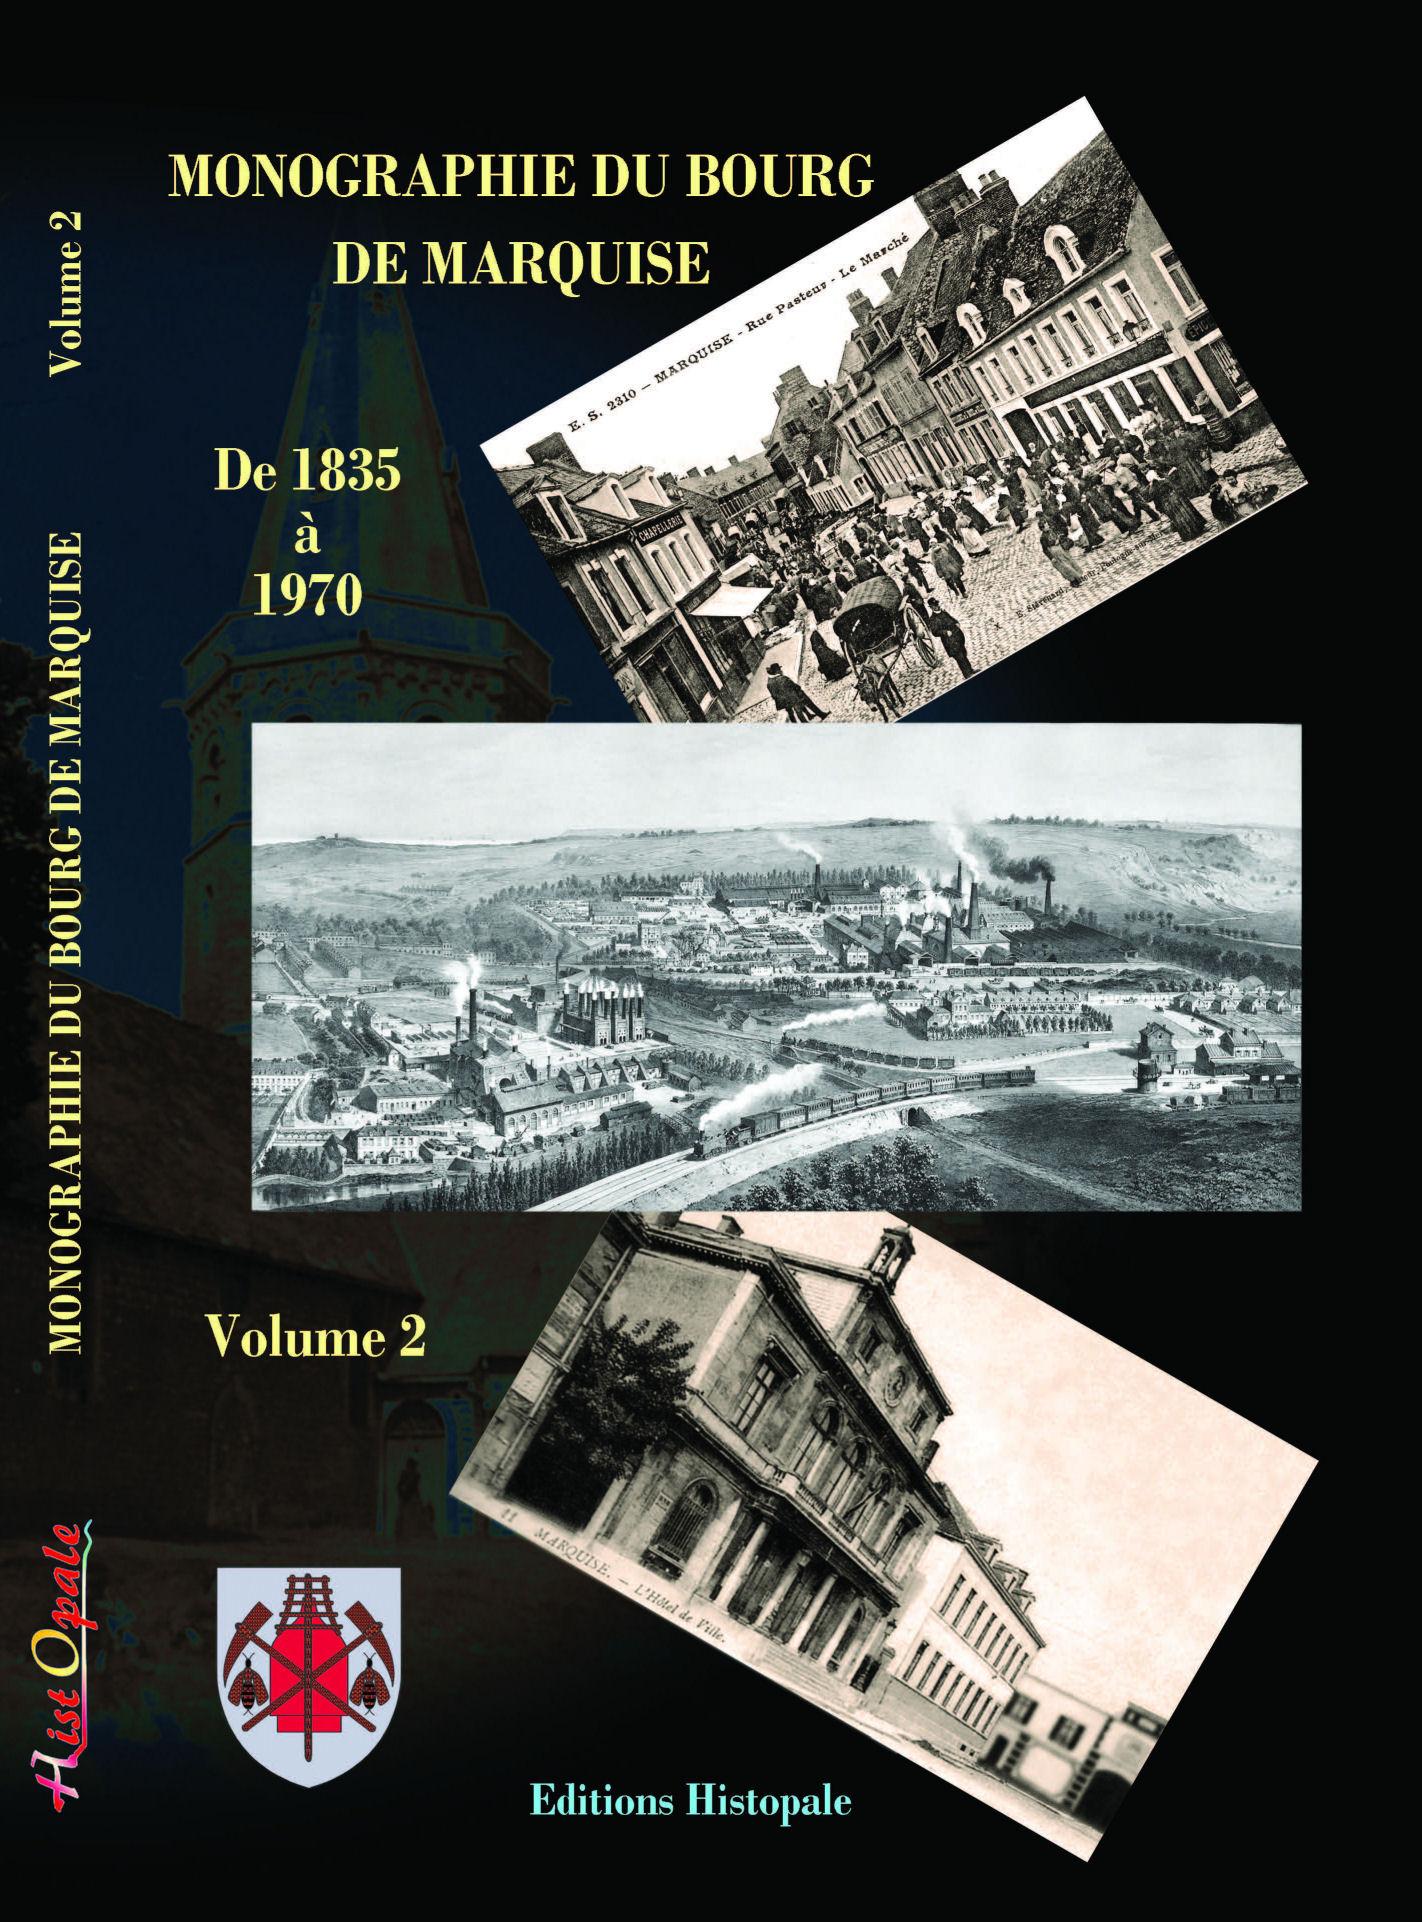 Monographie de Marquise volume 1 Histopale